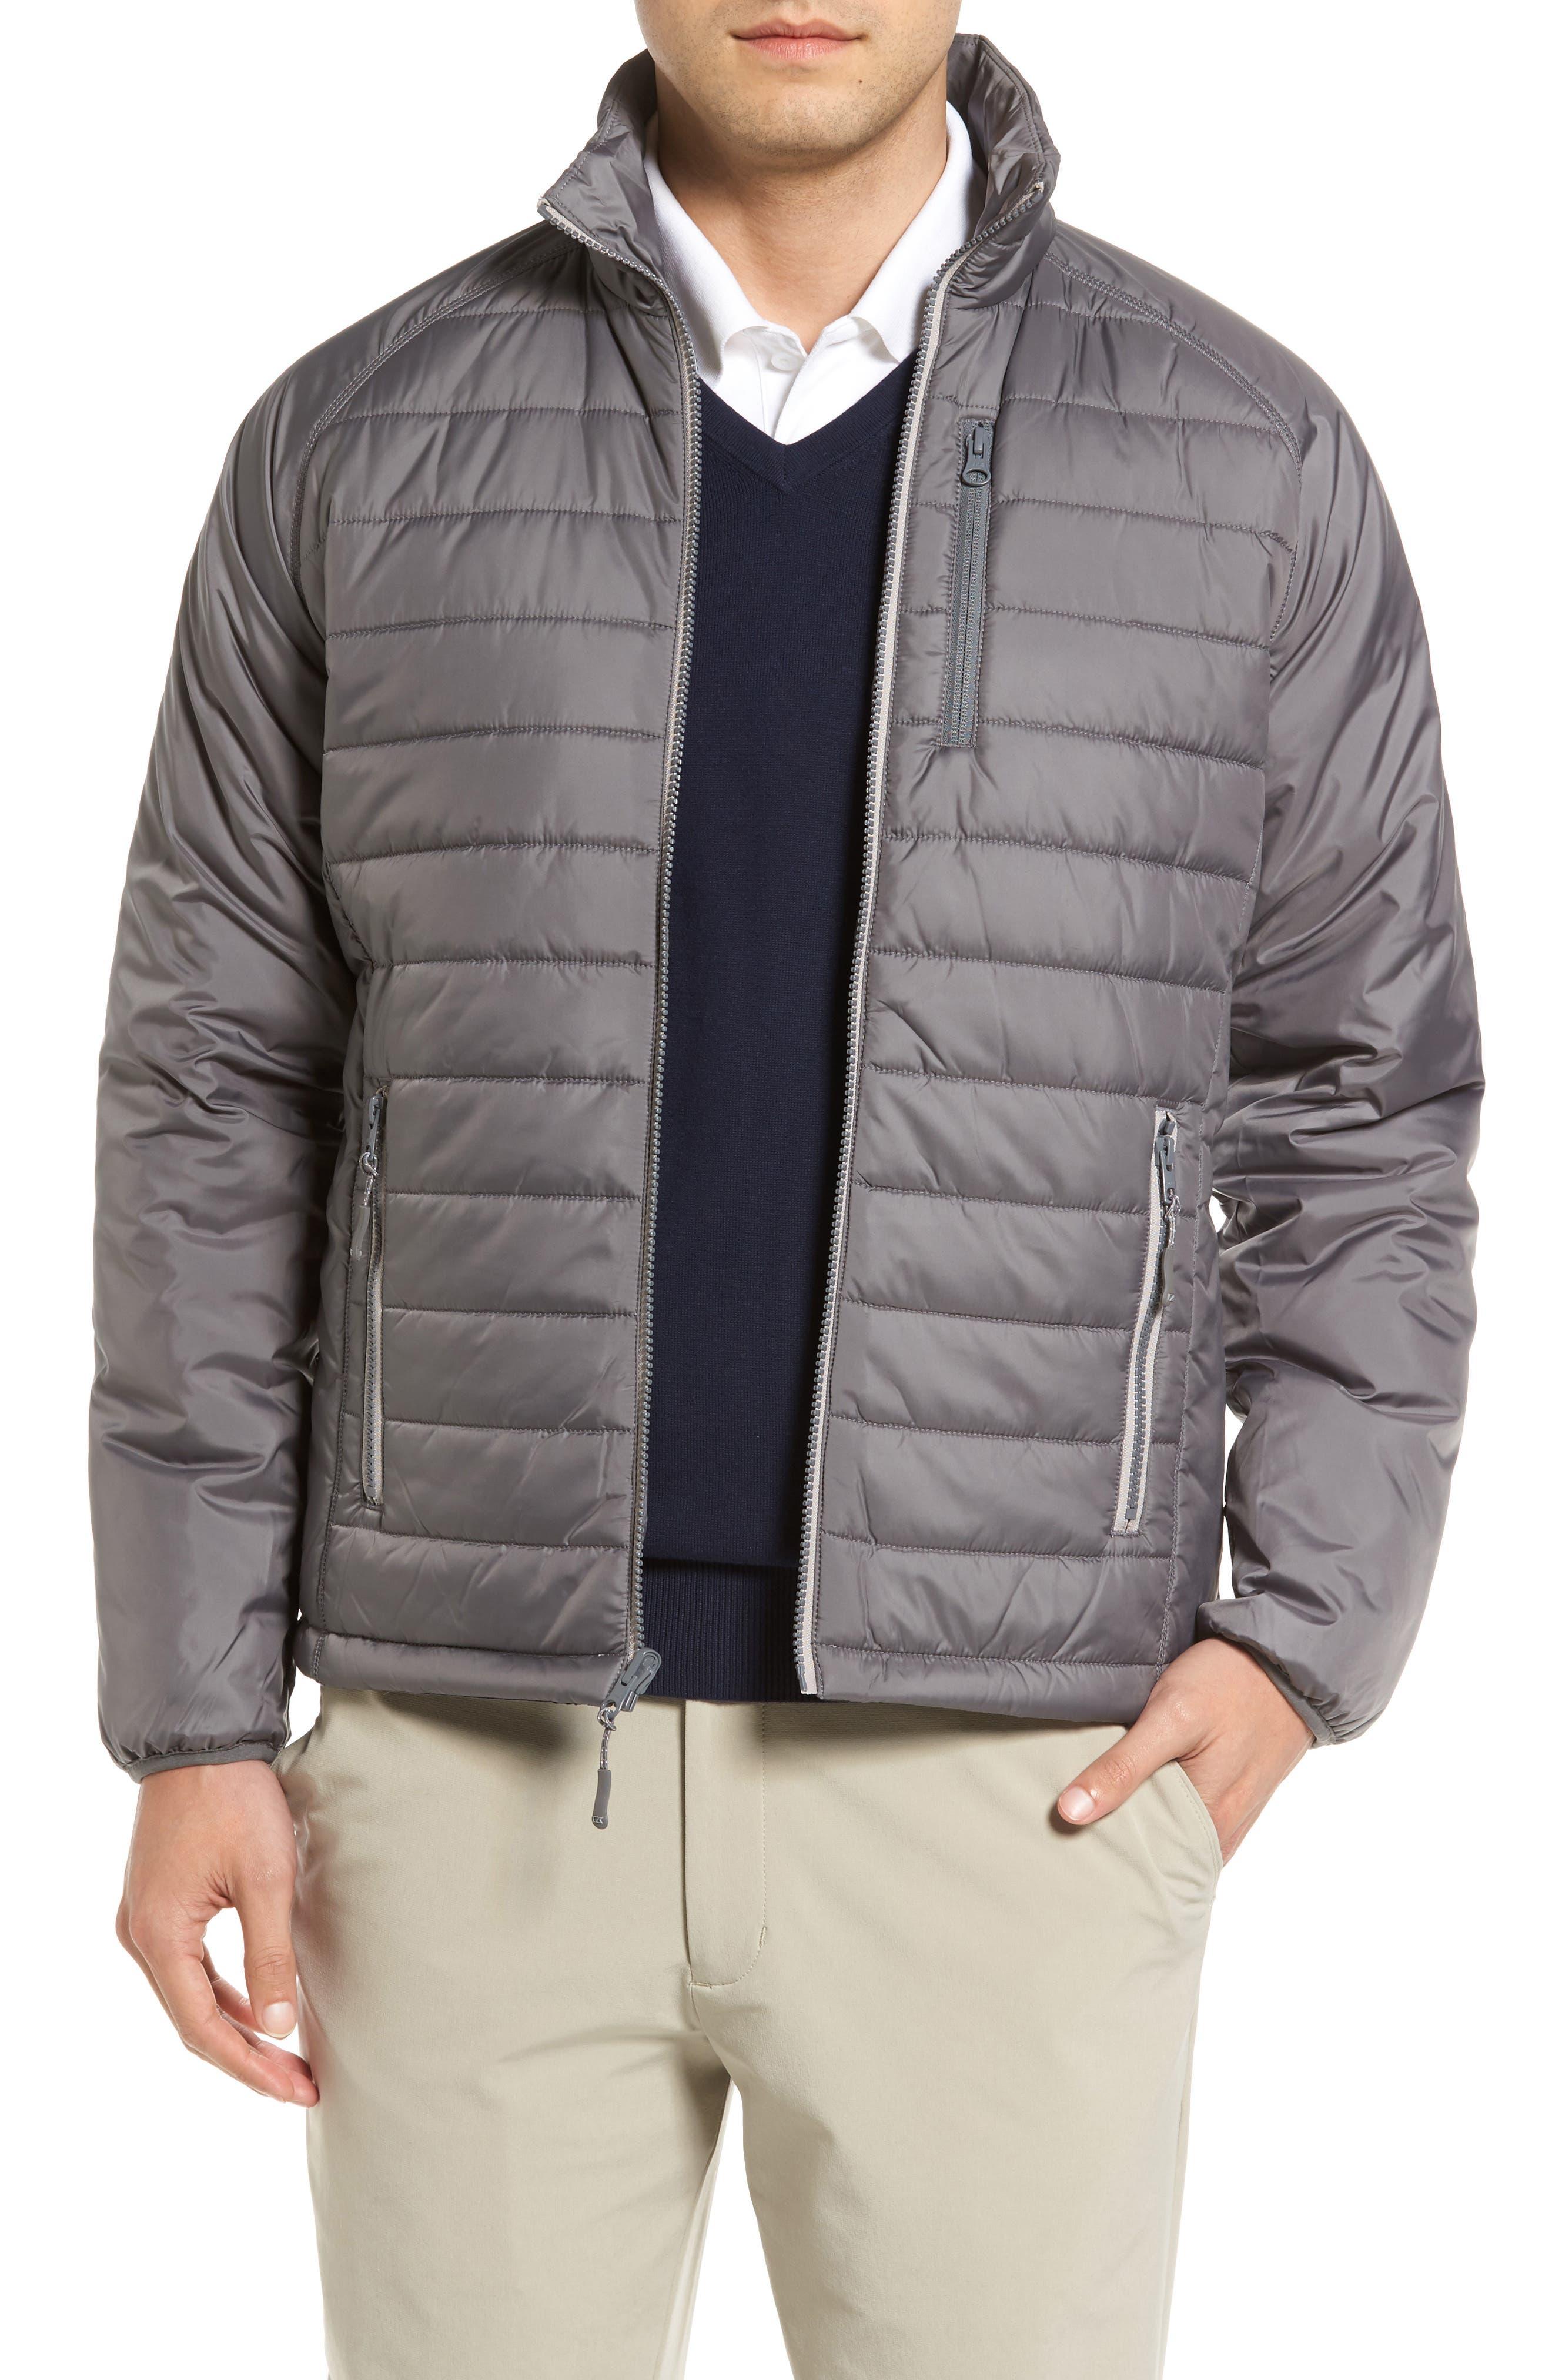 Cutter & Buck Barlow Pass Quilted Jacket (Big & Tall)